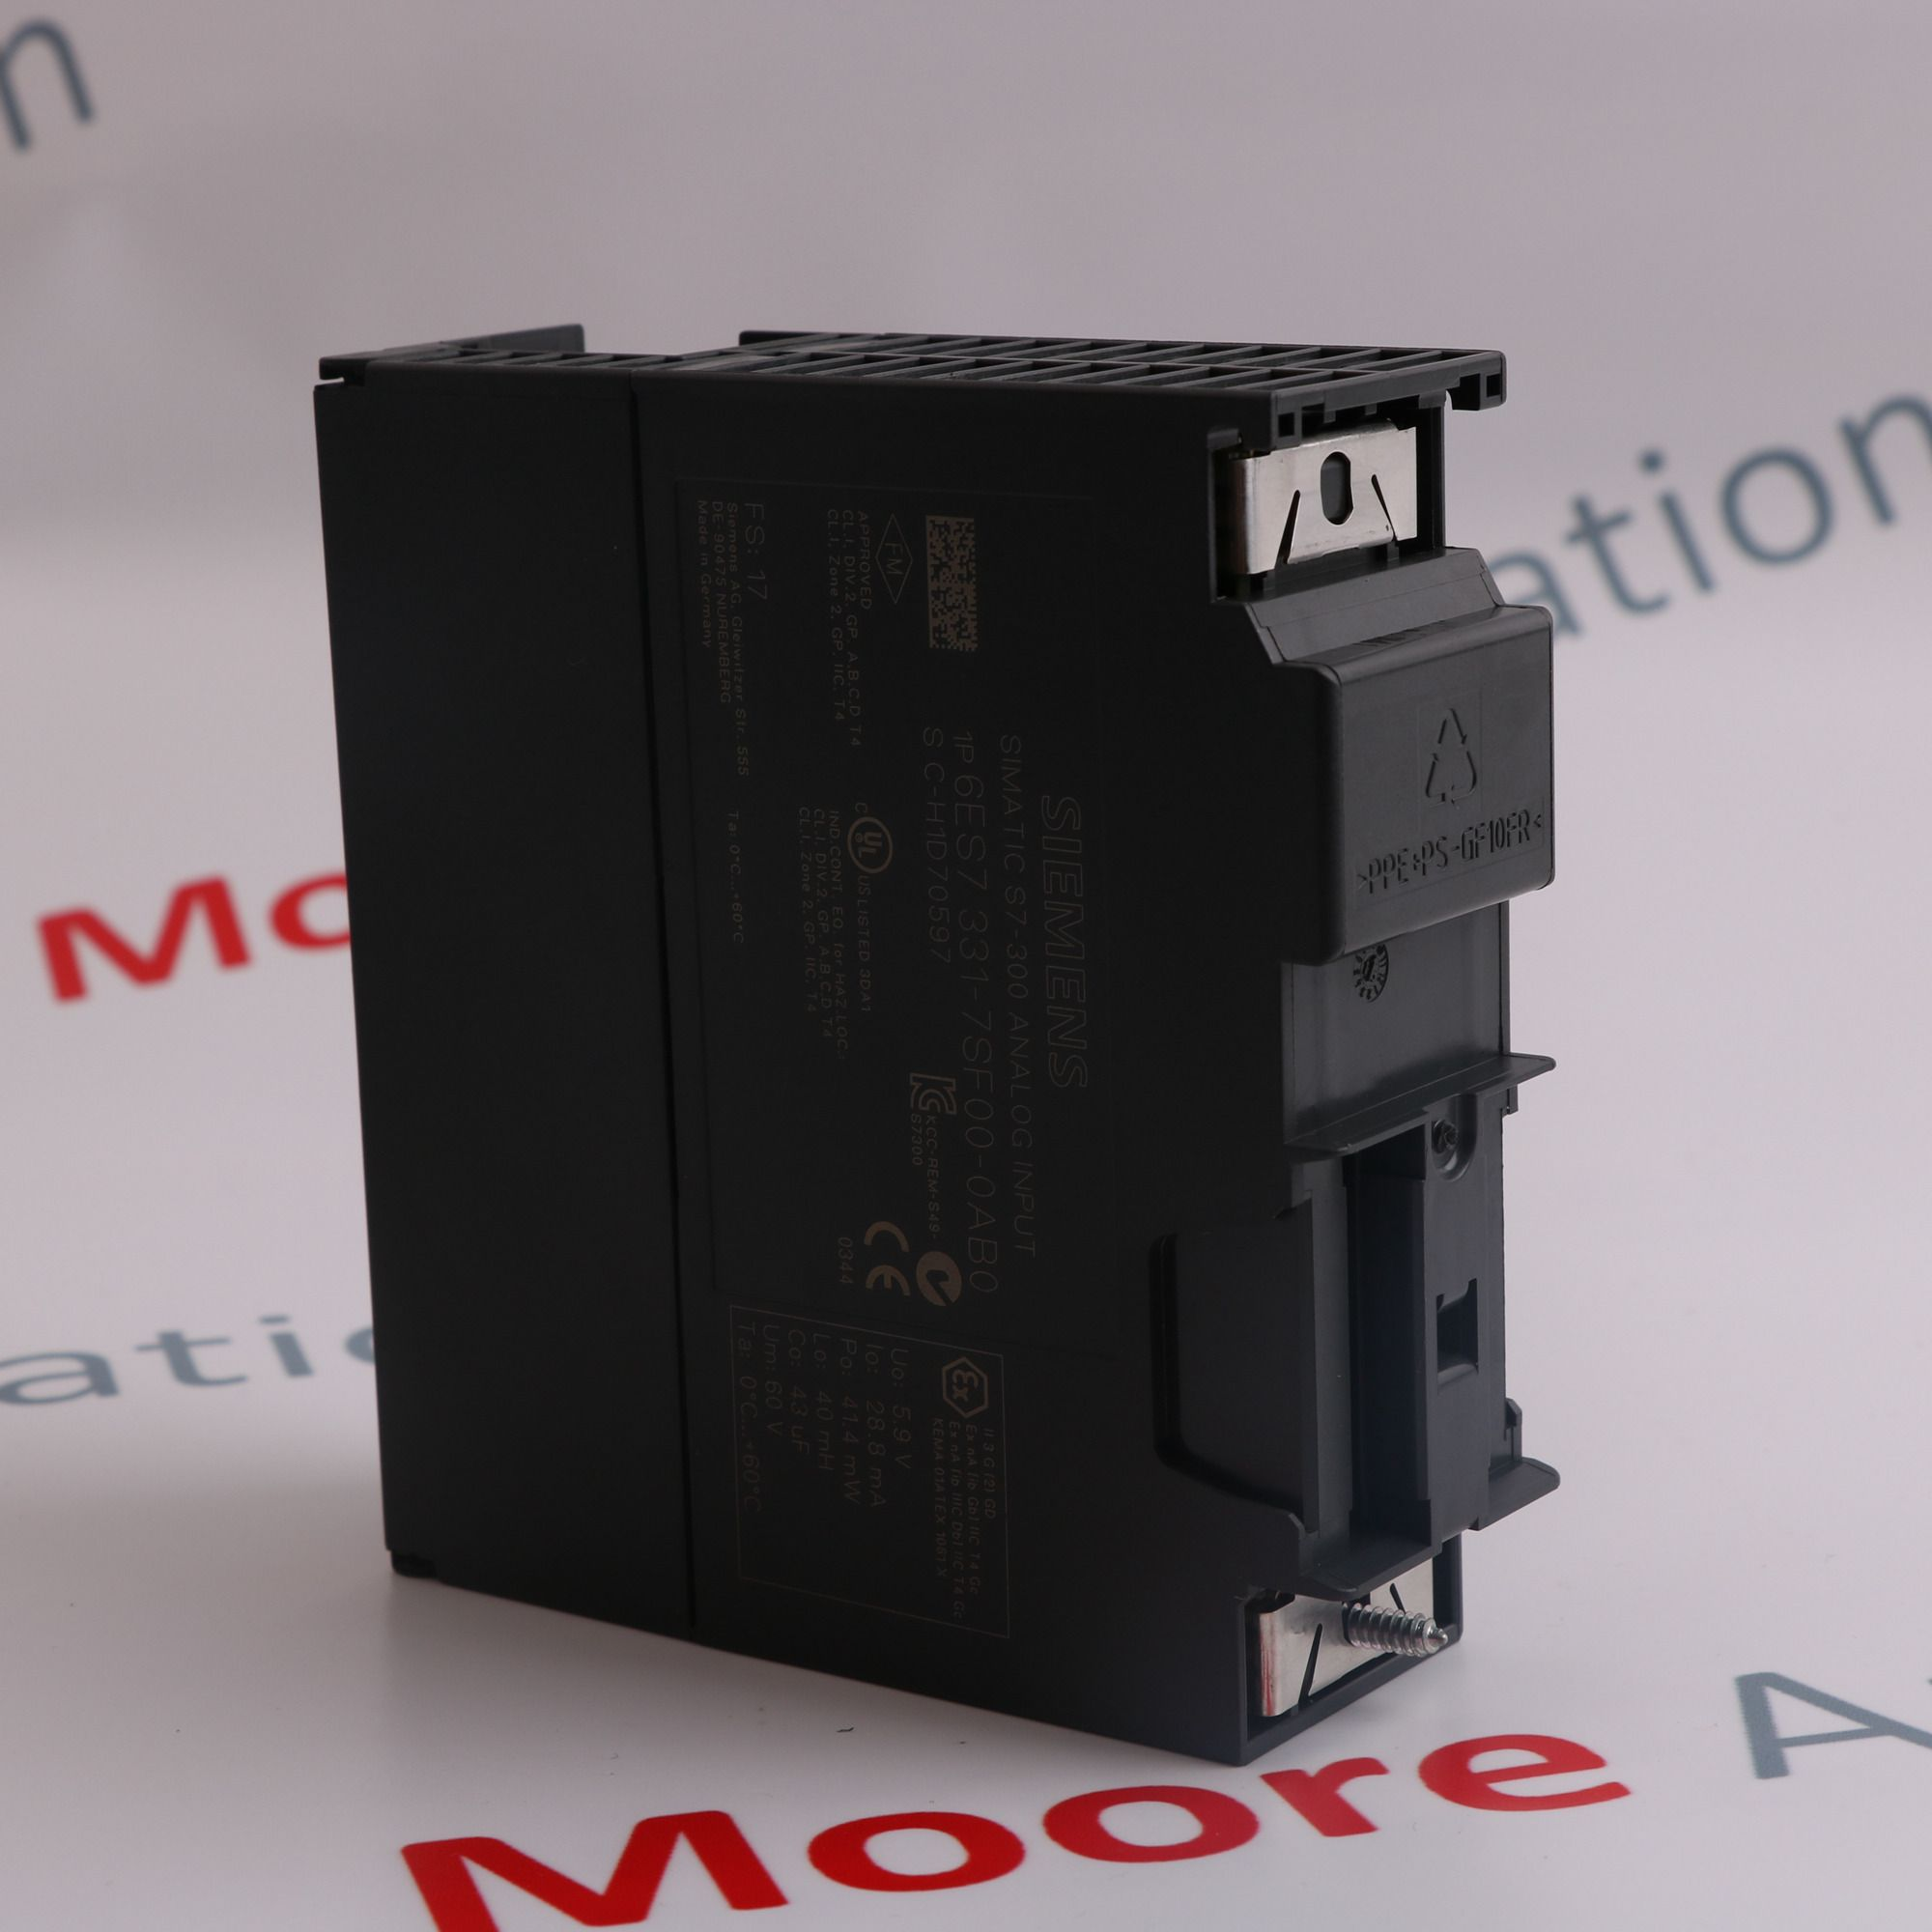 Buy WESTINGHOUSE 5X00070G04 one year warranty with new box